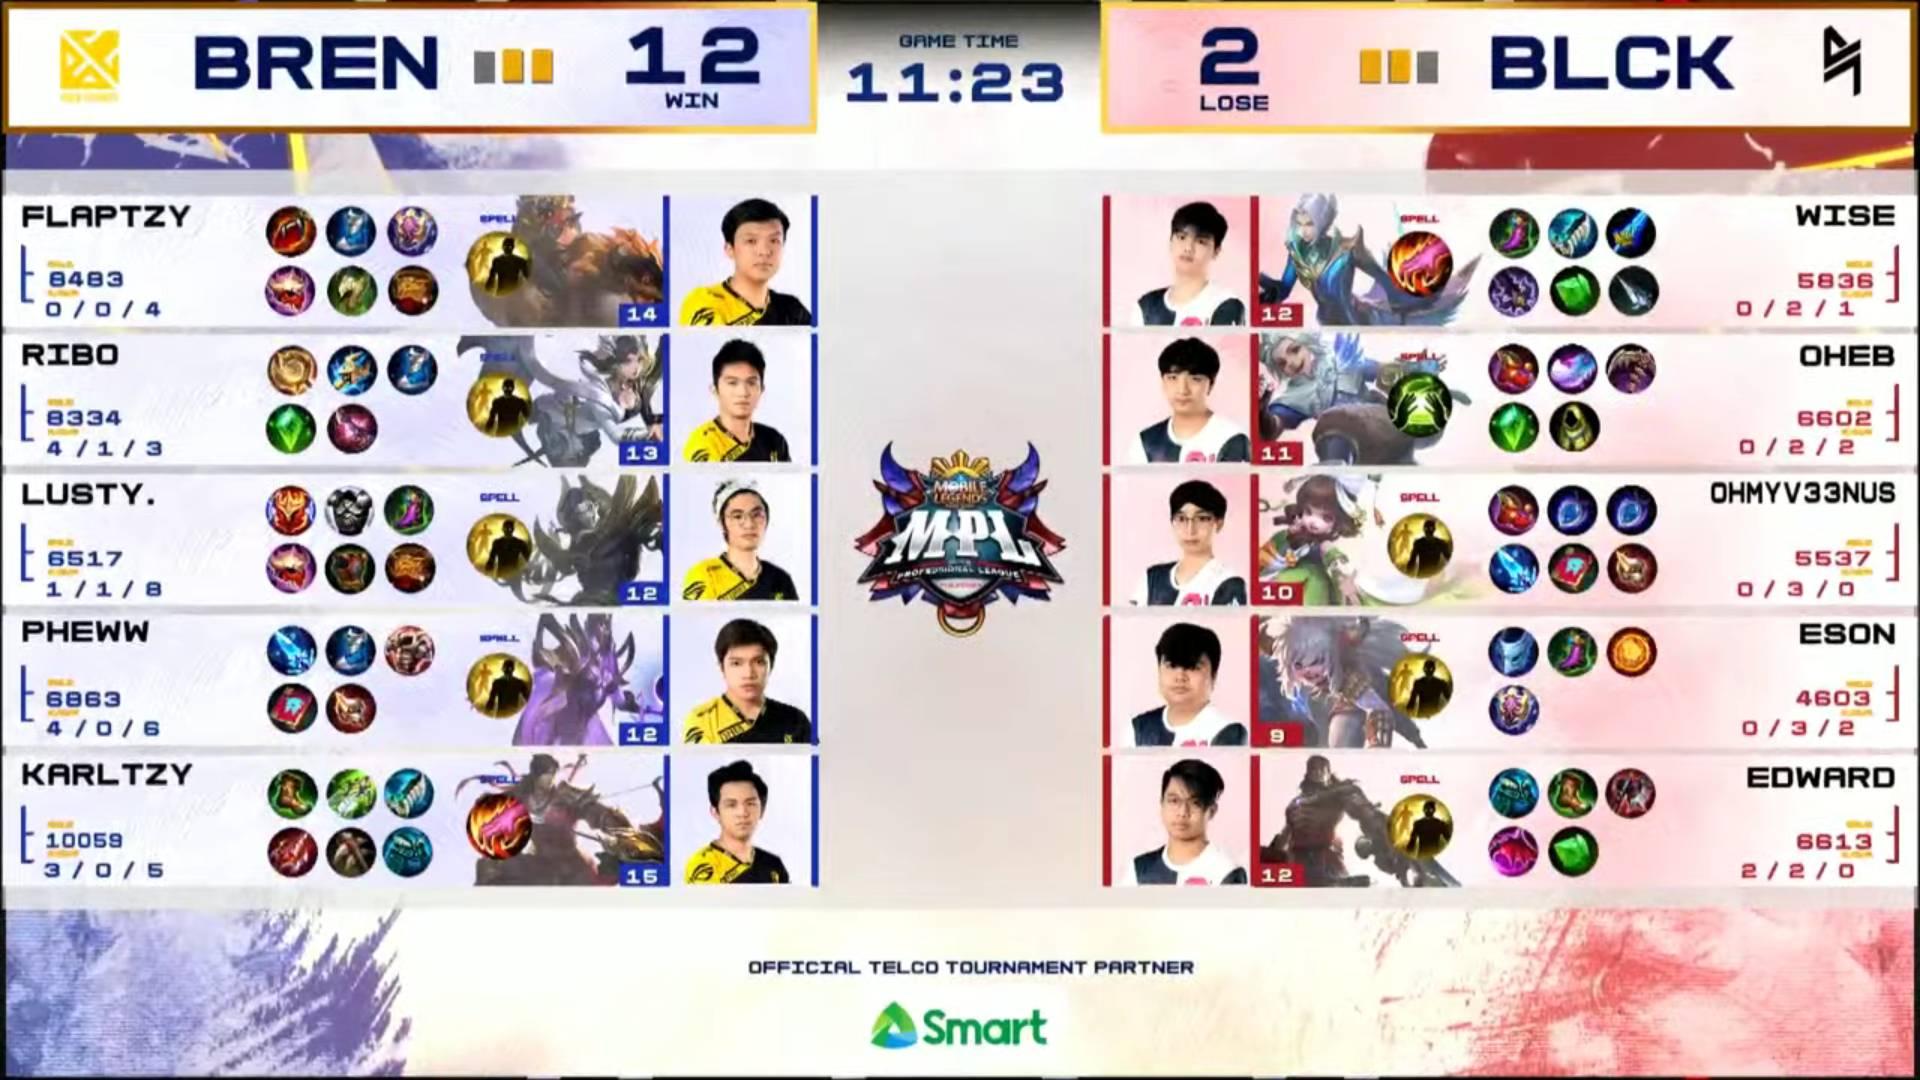 MPL-PH-Season-7-upper-bracket-Blacklist-def-Bren-Game-4 Edward, Blacklist survive KarlTzy's storm, sends Bren to MPL lower bracket ESports Mobile Legends MPL-PH News  - philippine sports news